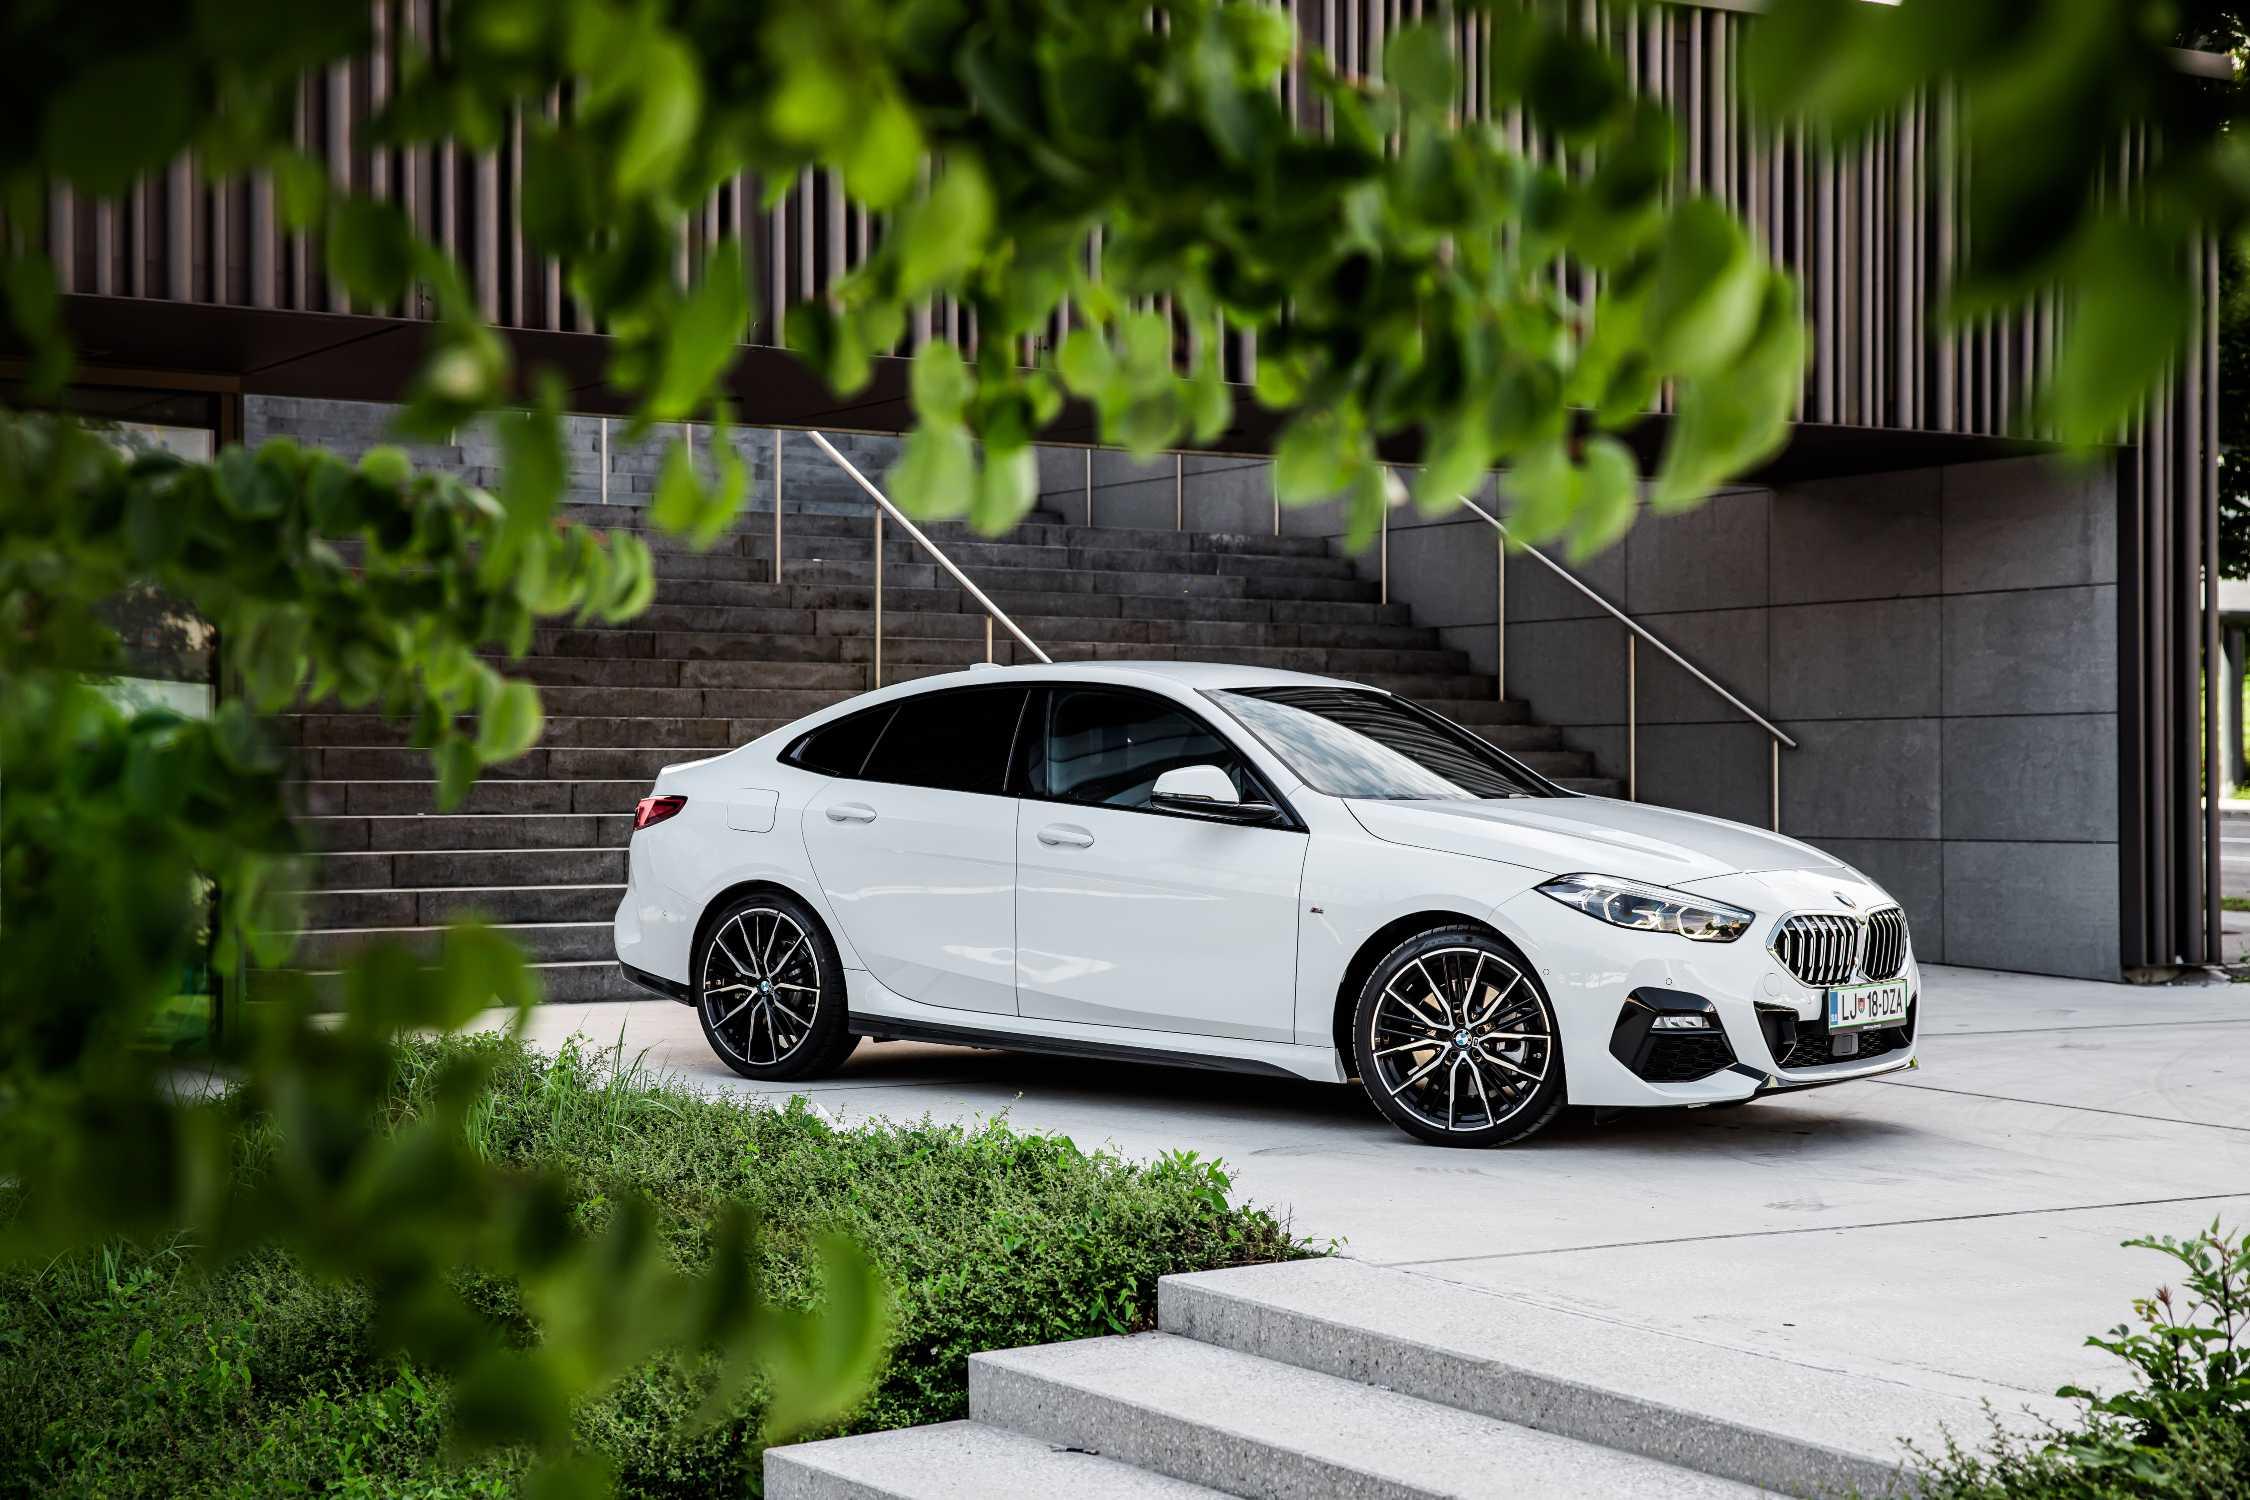 BMW 2 series GC  (08/2020)